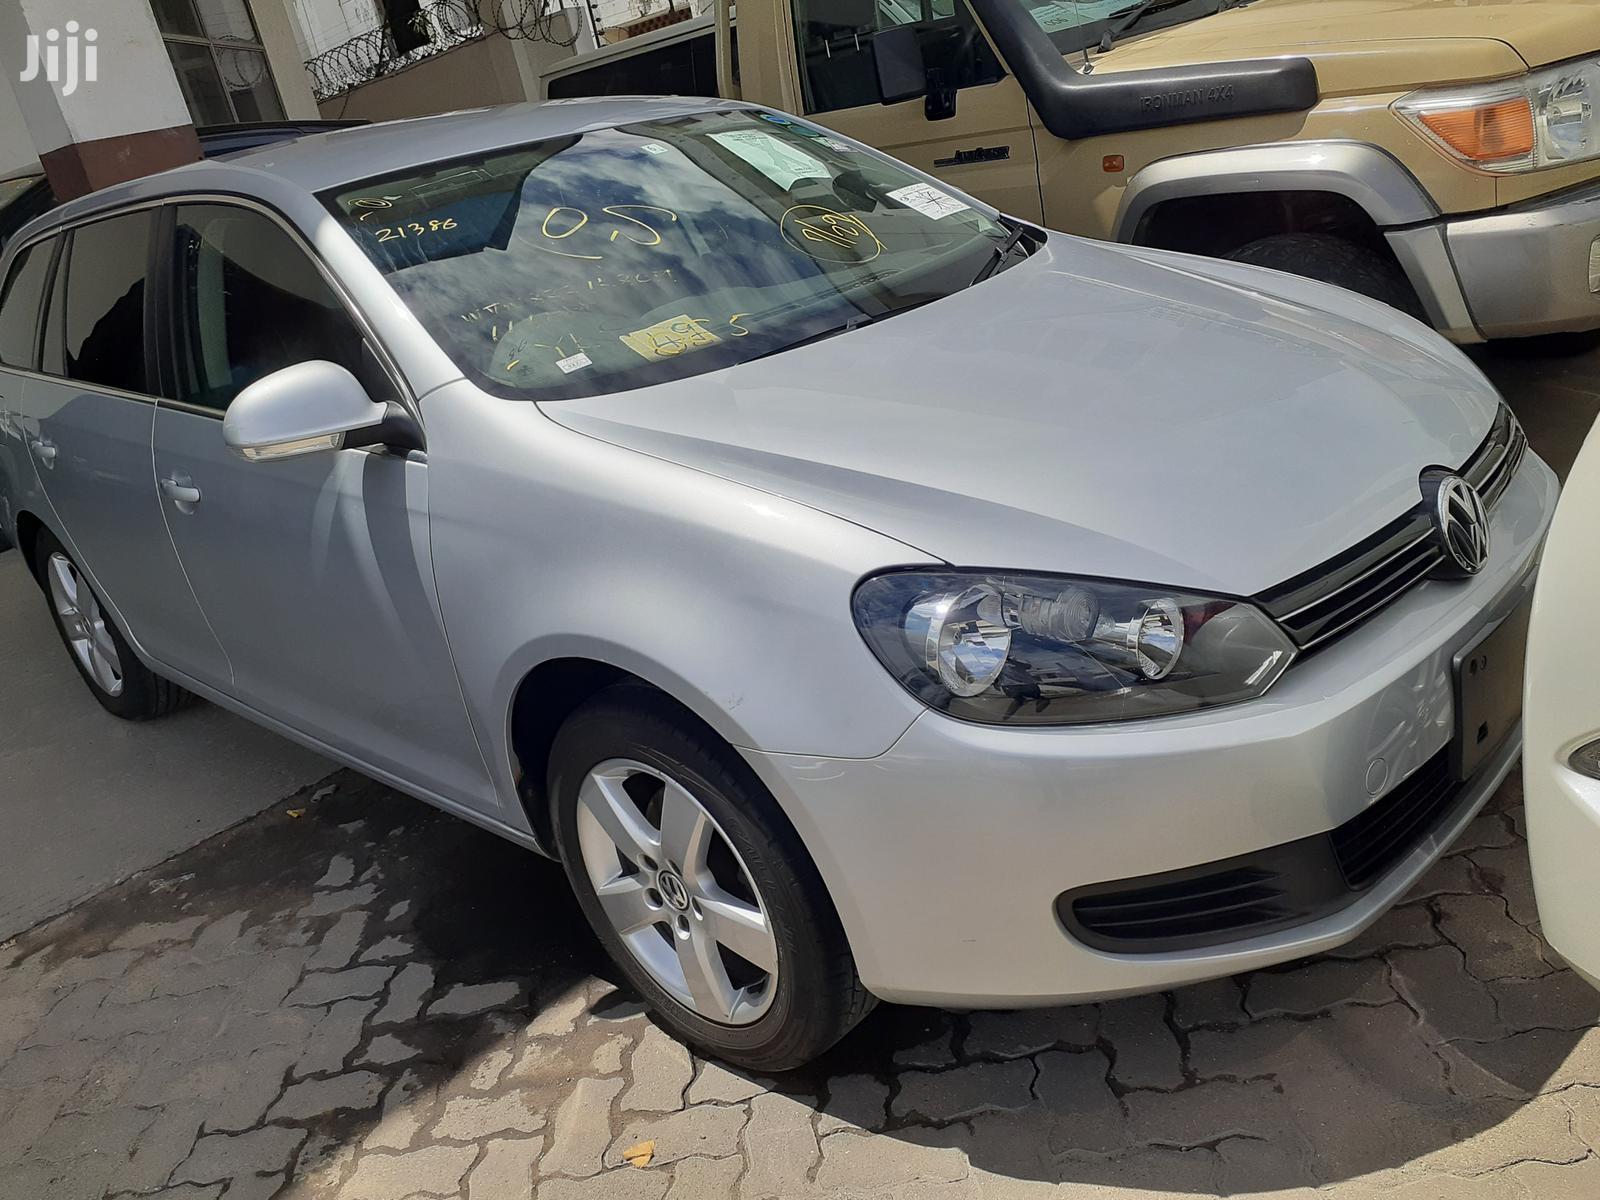 Archive: New Volkswagen Golf 2013 Silver